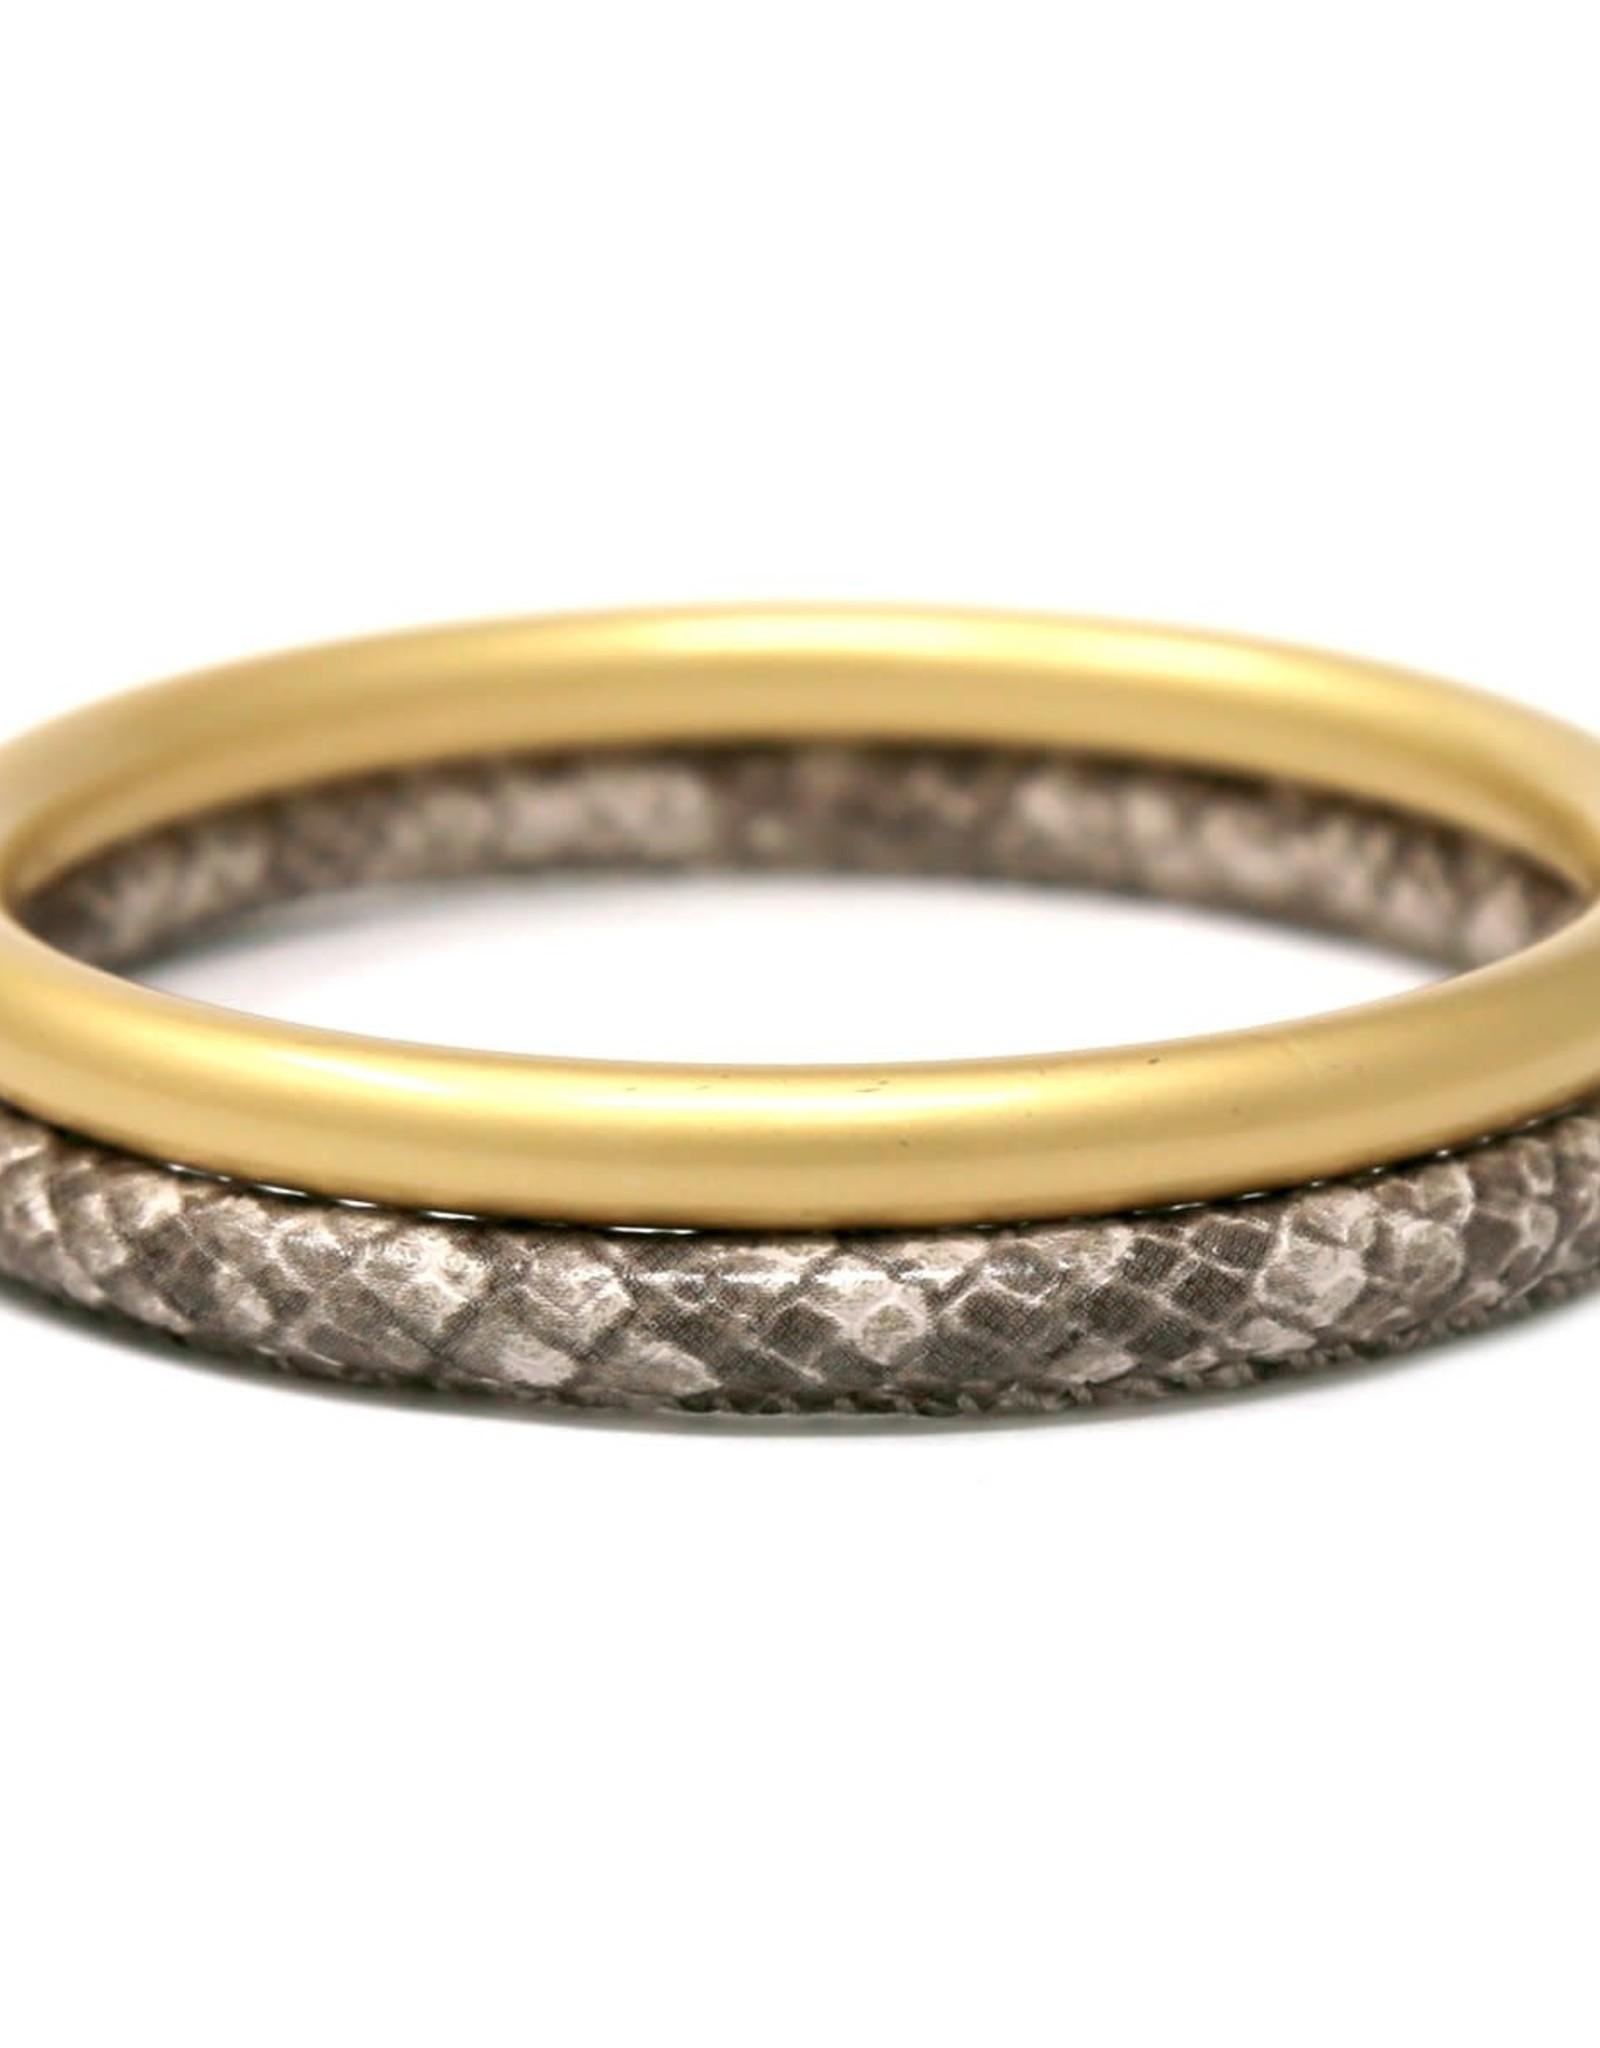 USJ Animal Print Faux Leather Metal Bangle Bracelet Set